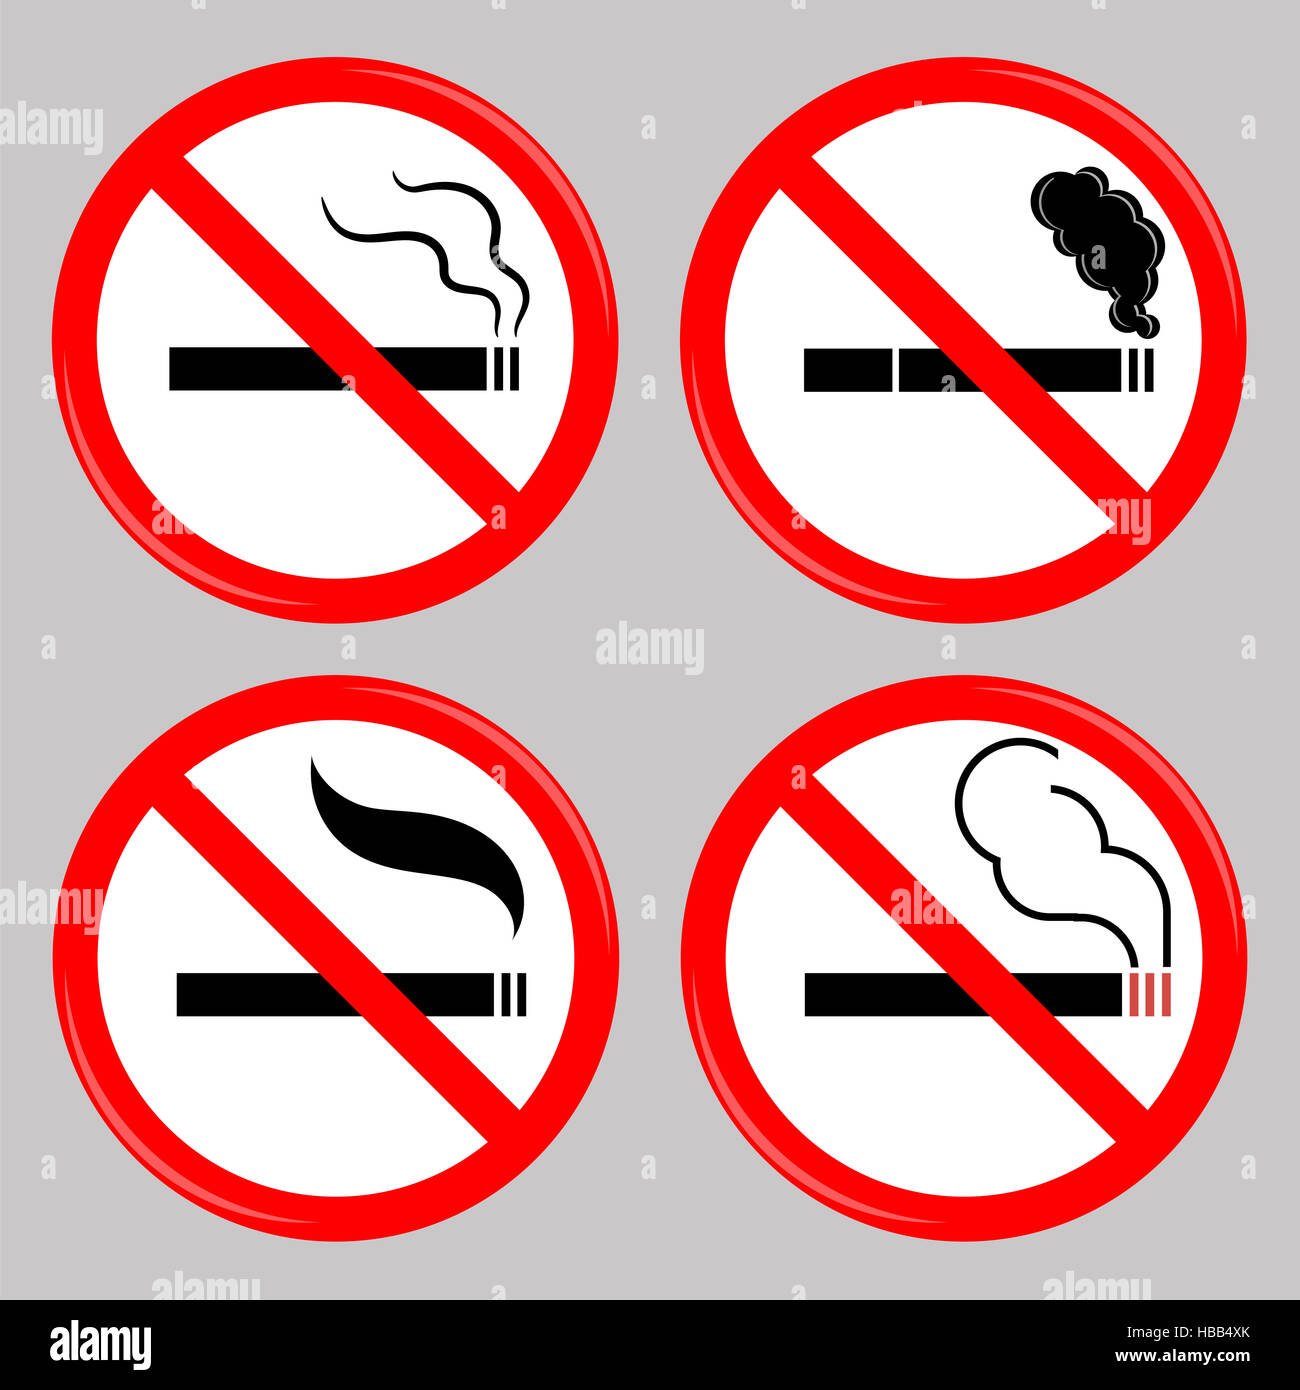 No smoking cigarette prohibited symbols stock photo 127479147 alamy no smoking cigarette prohibited symbols biocorpaavc Image collections